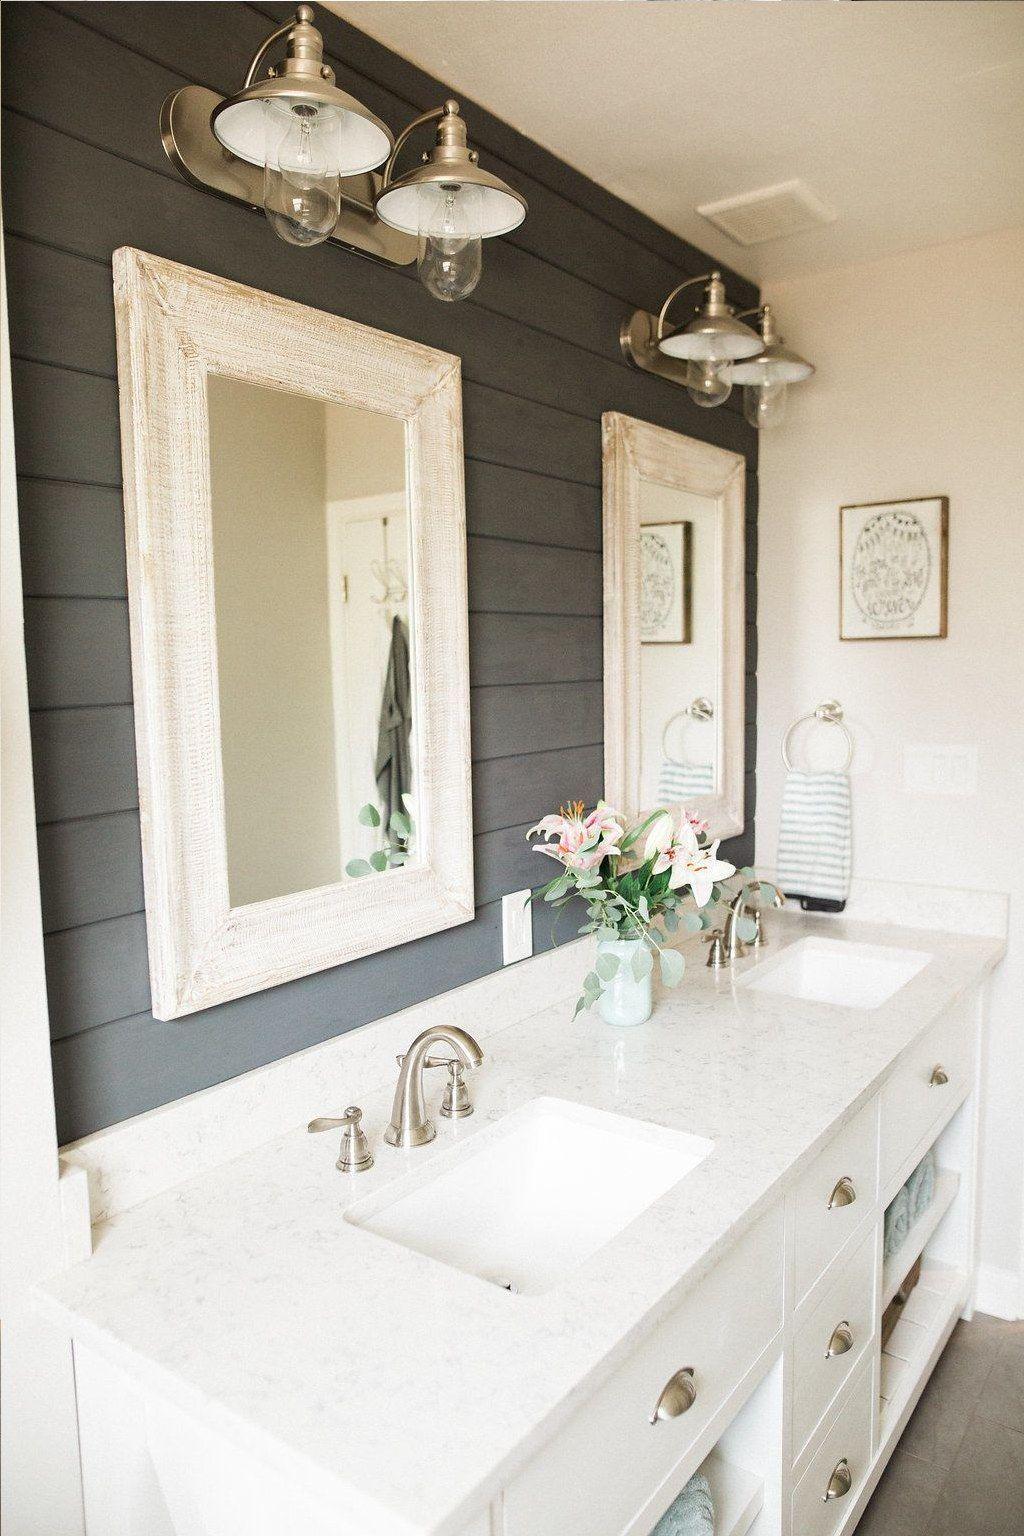 Bathroom Decor Make A Splash With Your Own Bathroom Interior